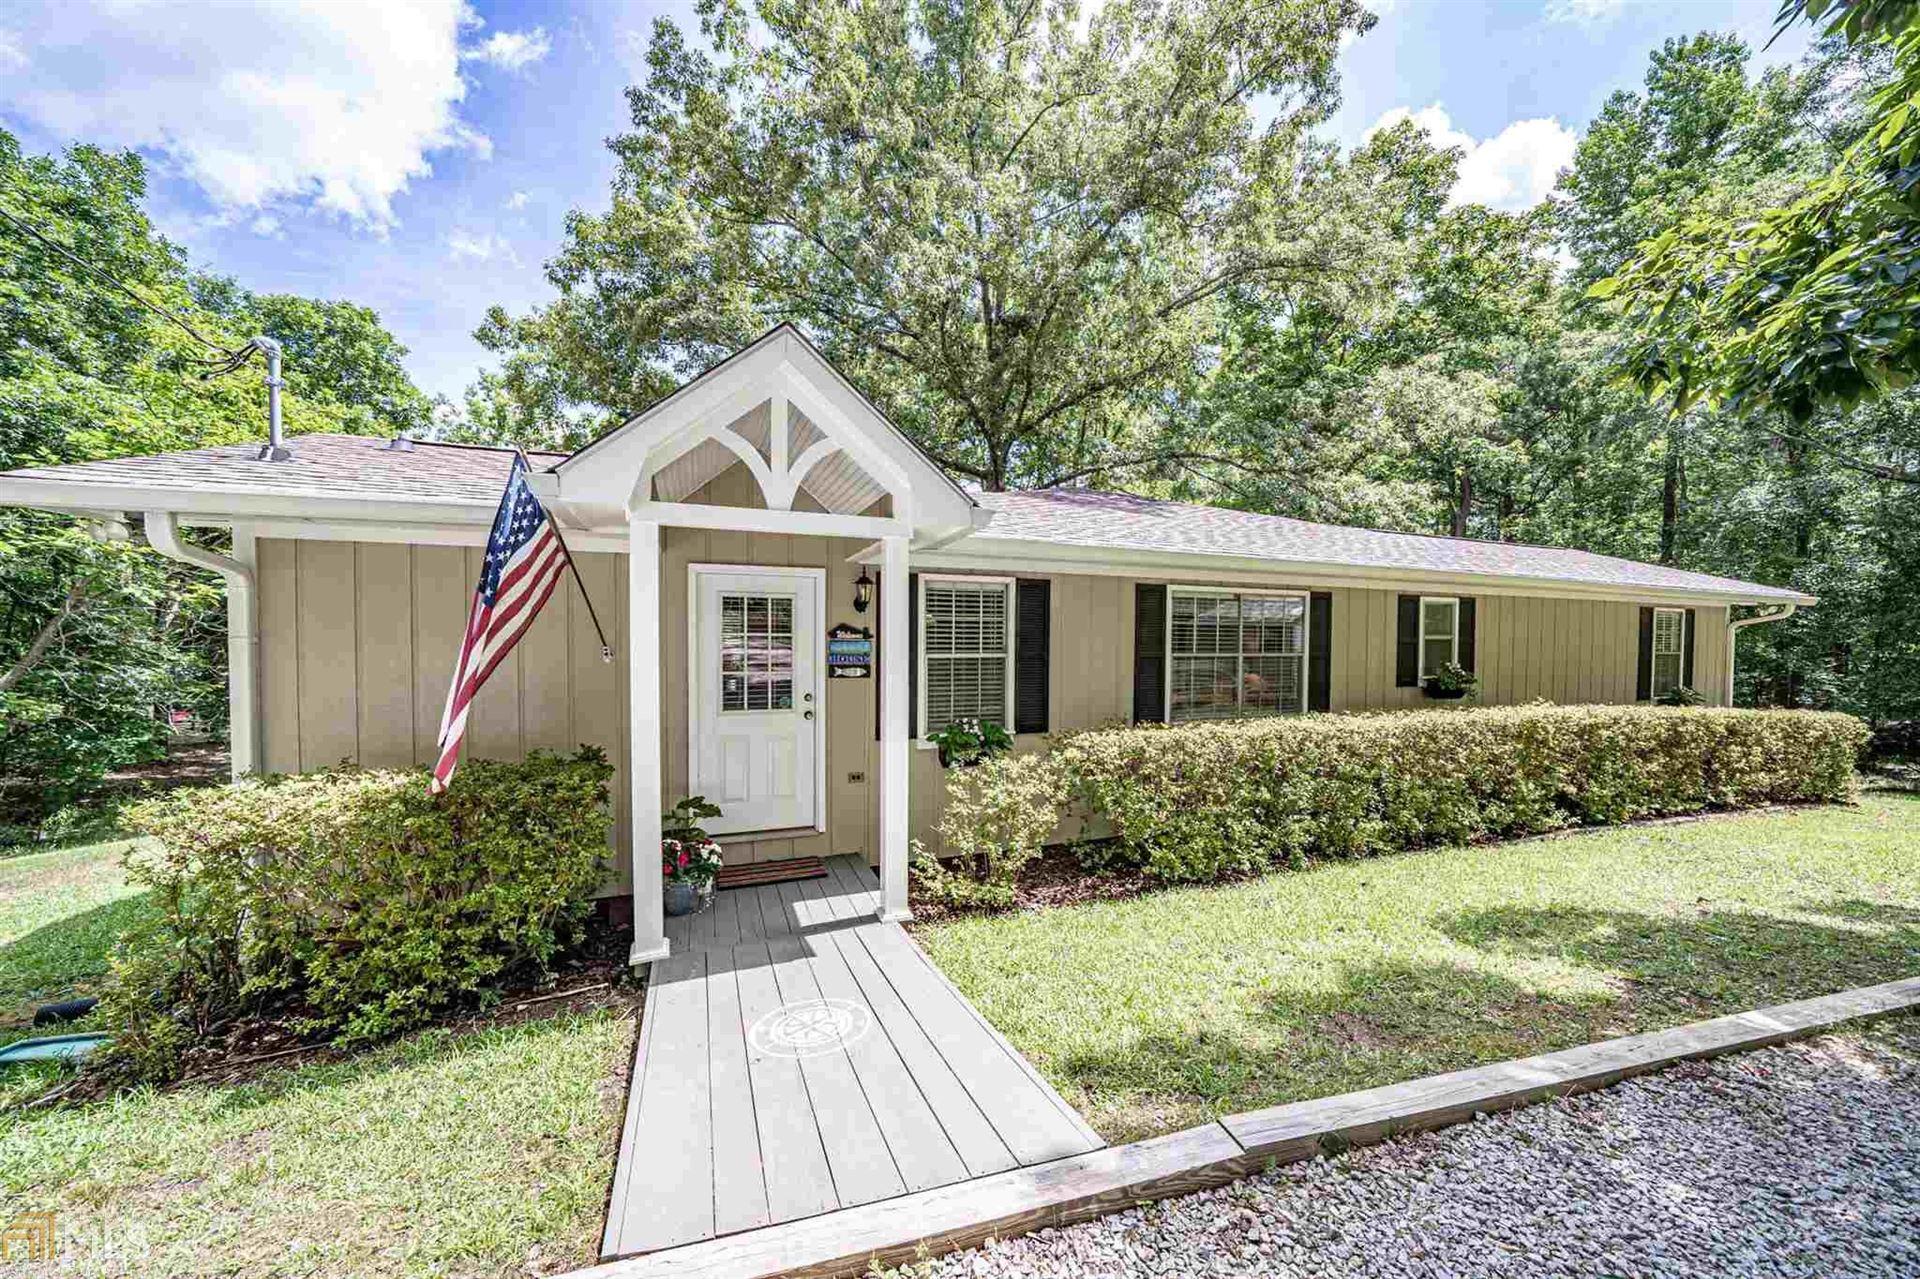 382 Hub Dent Rd, Milledgeville, GA 31061 - MLS#: 8994943